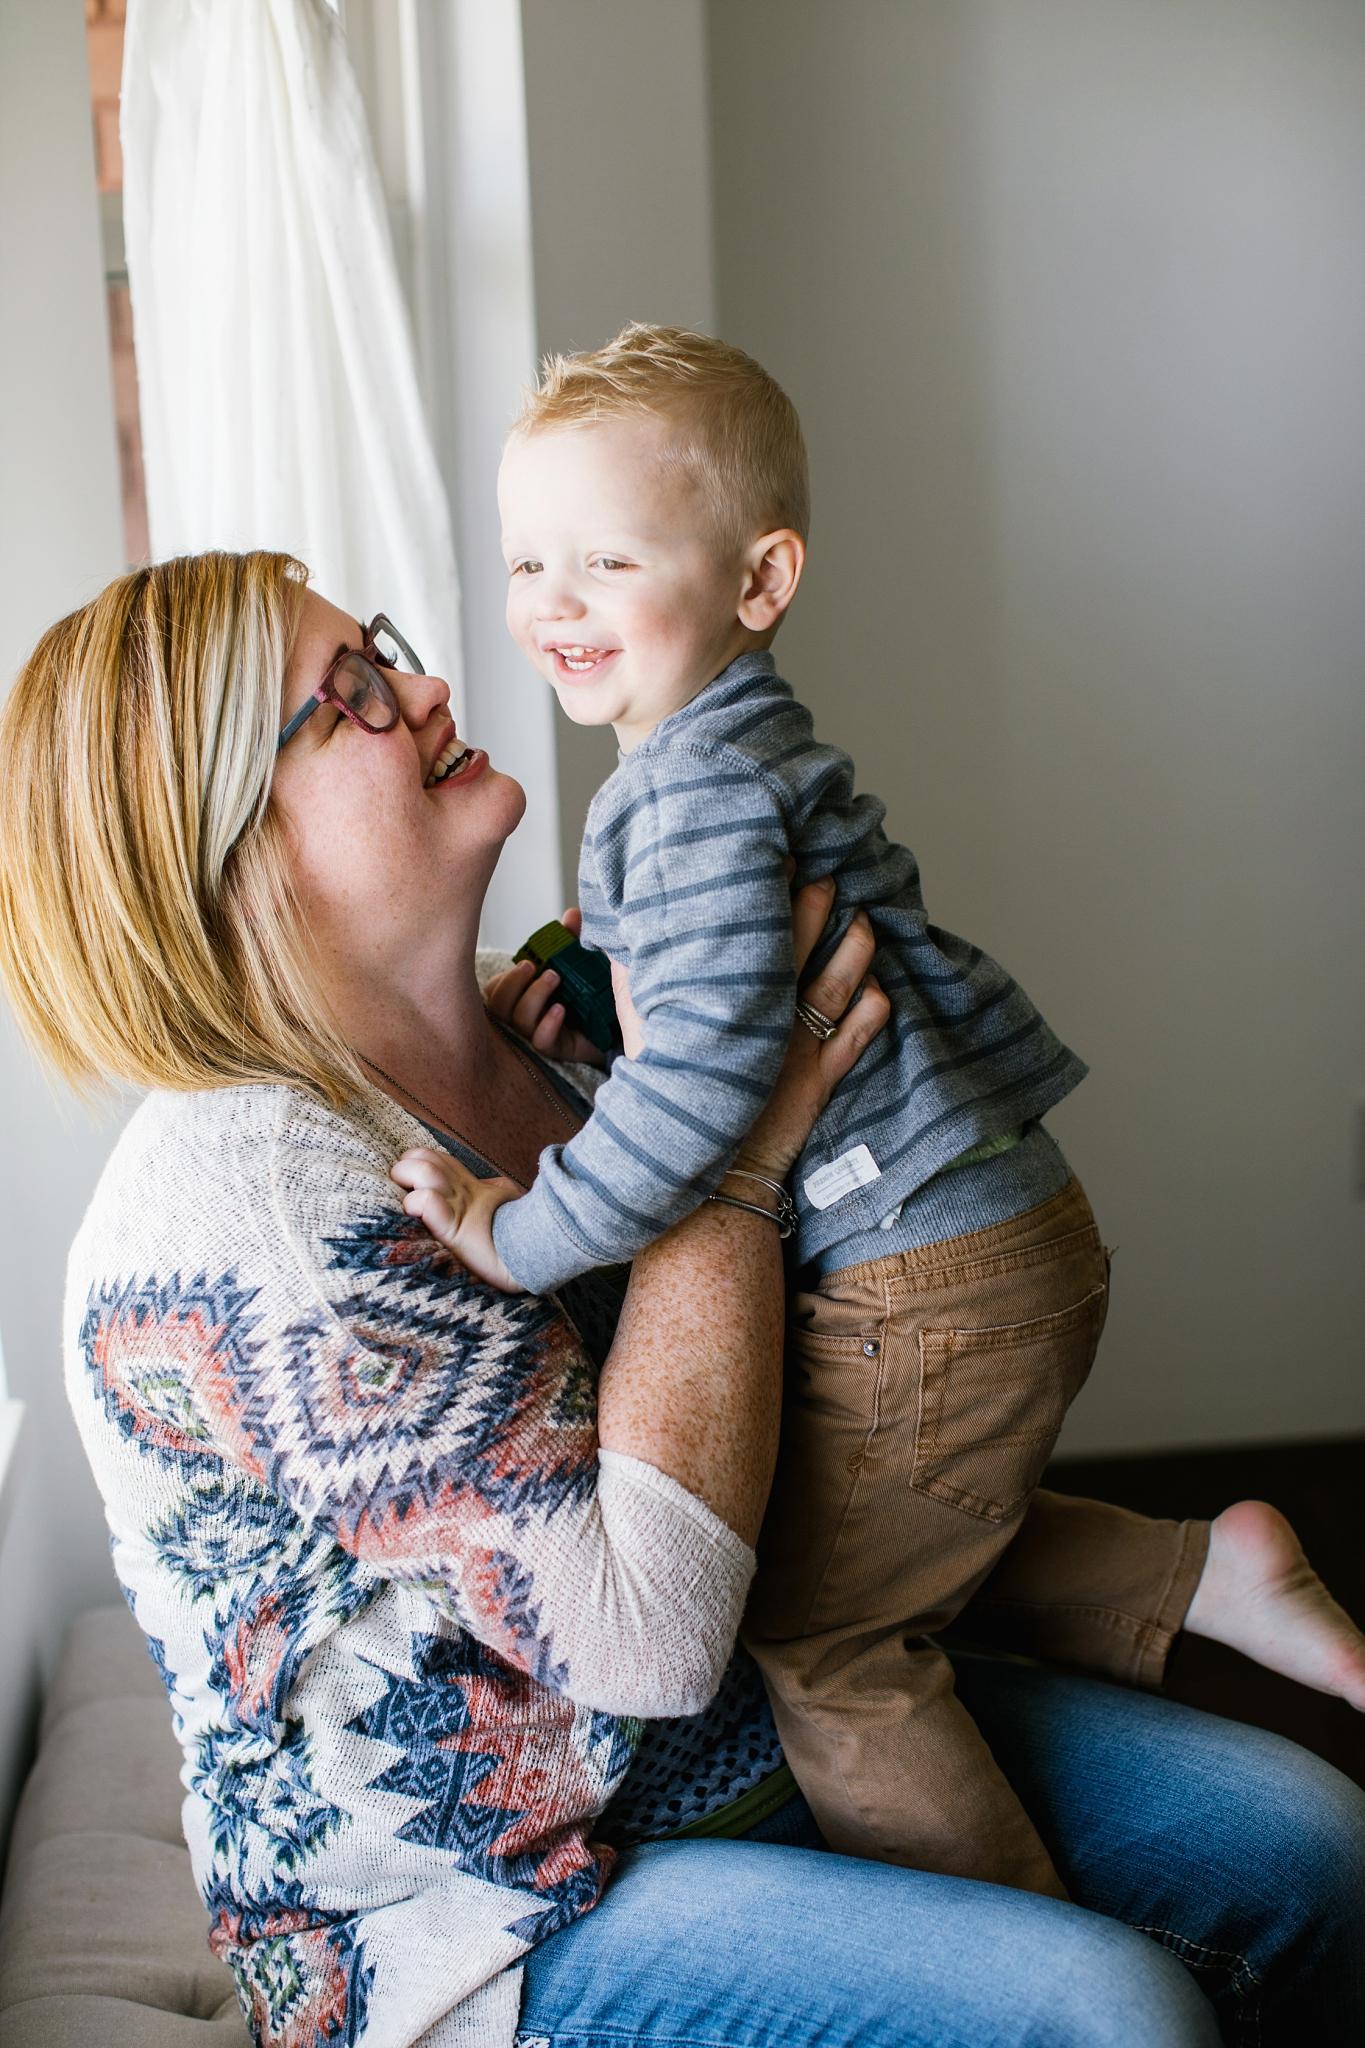 MommyandMe-62E_Lizzie-B-Imagery-Utah-Family-Photographer-Lifestyle-Photography-Salt-Lake-City-Park-City-Utah-County-Mommy-and-Me-Mini-Session-Studio.jpg